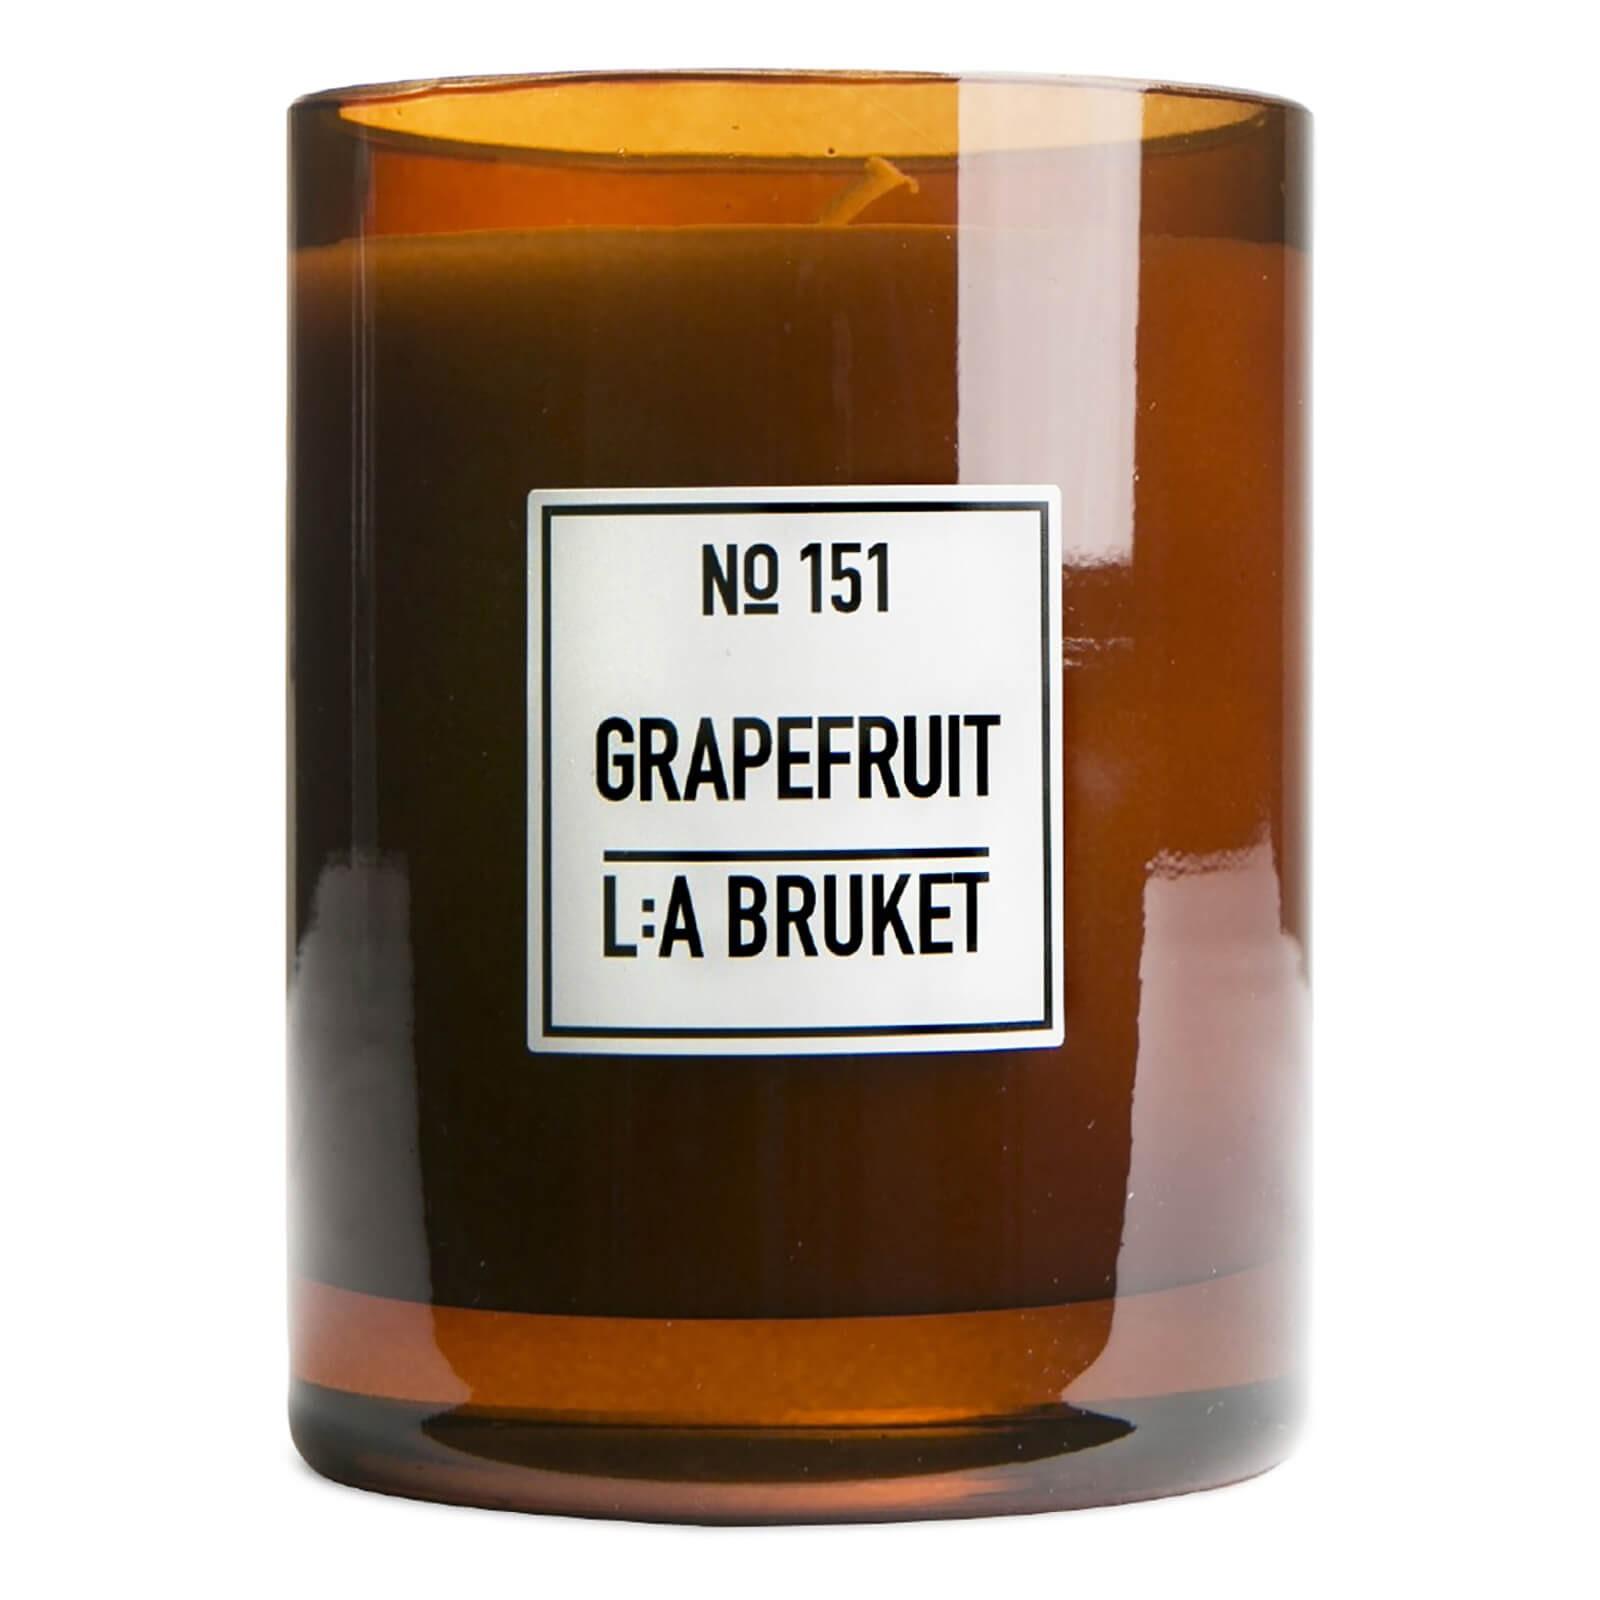 L:A BRUKET 大罐葡萄柚香氛蜡烛 260g